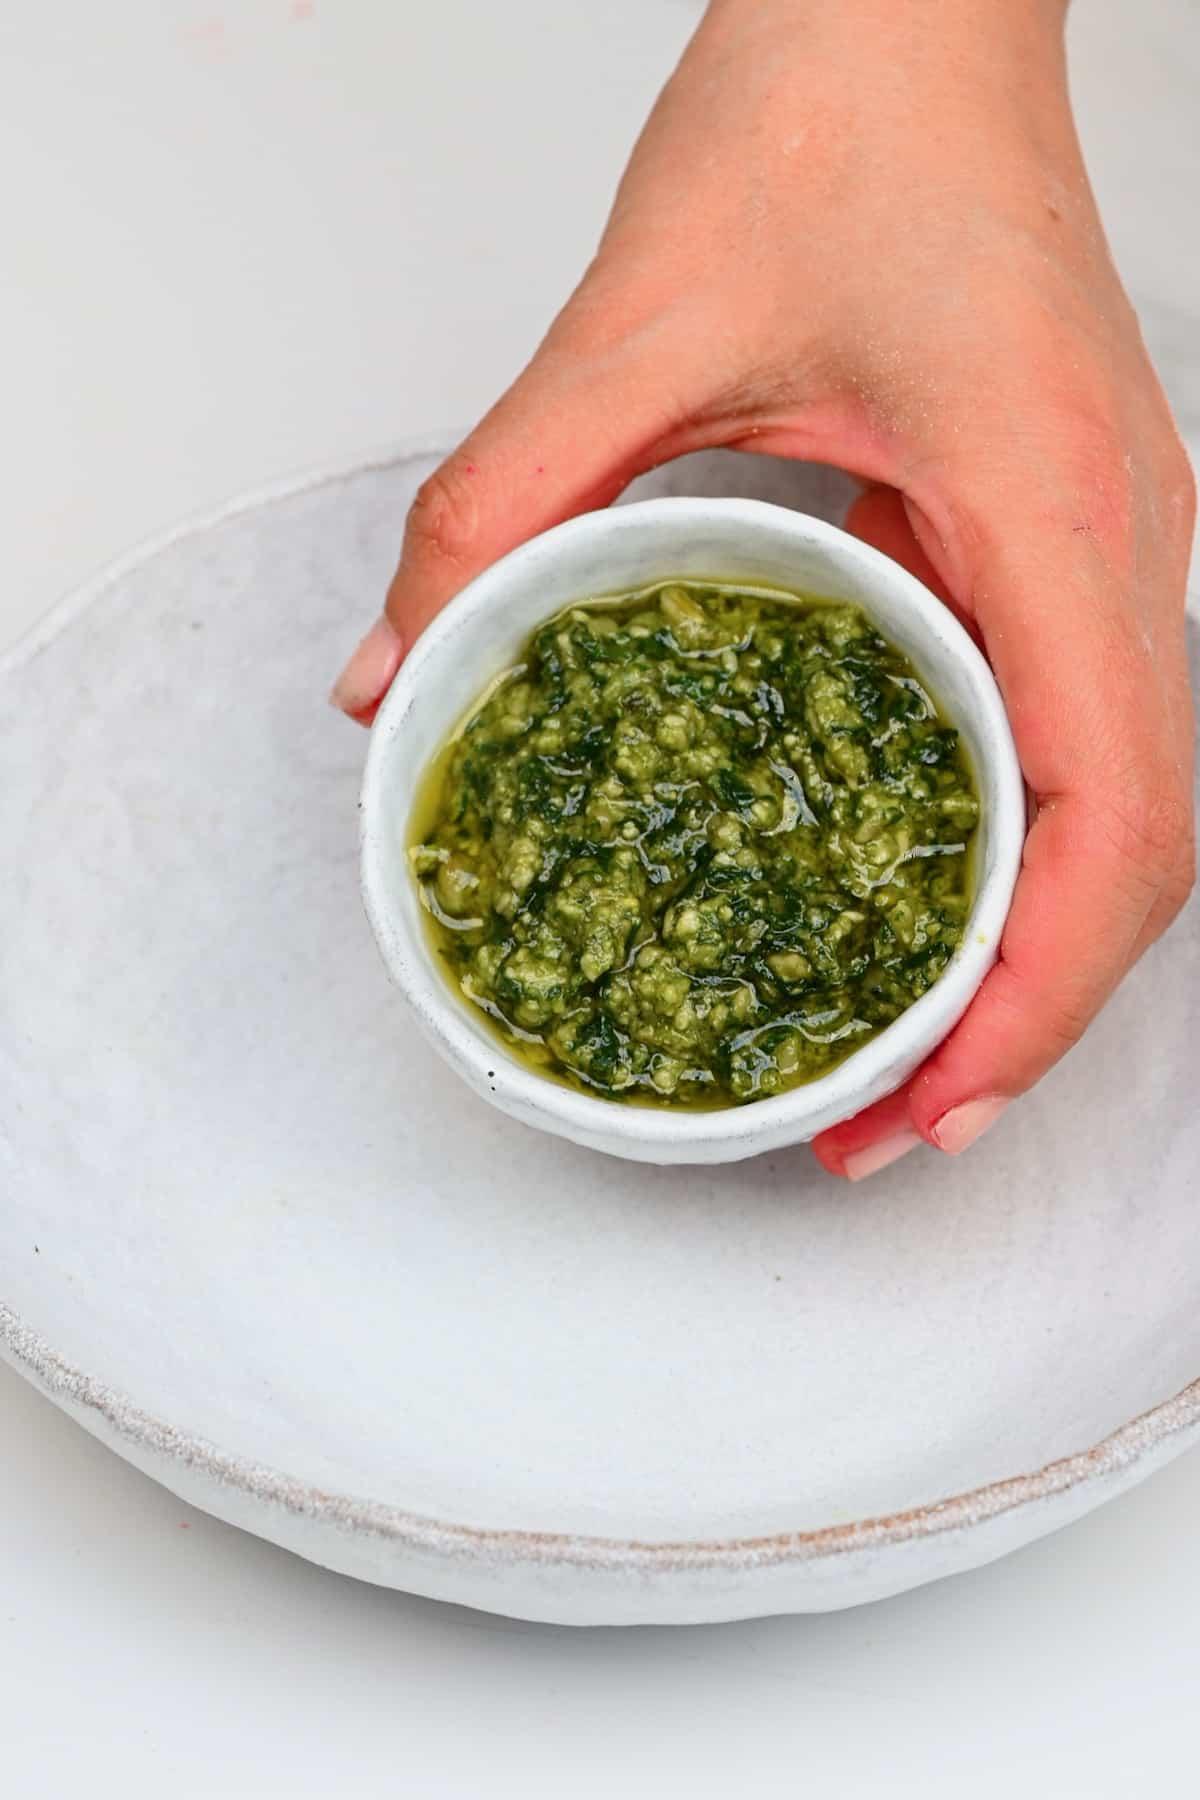 Basil pesto in a small bowl